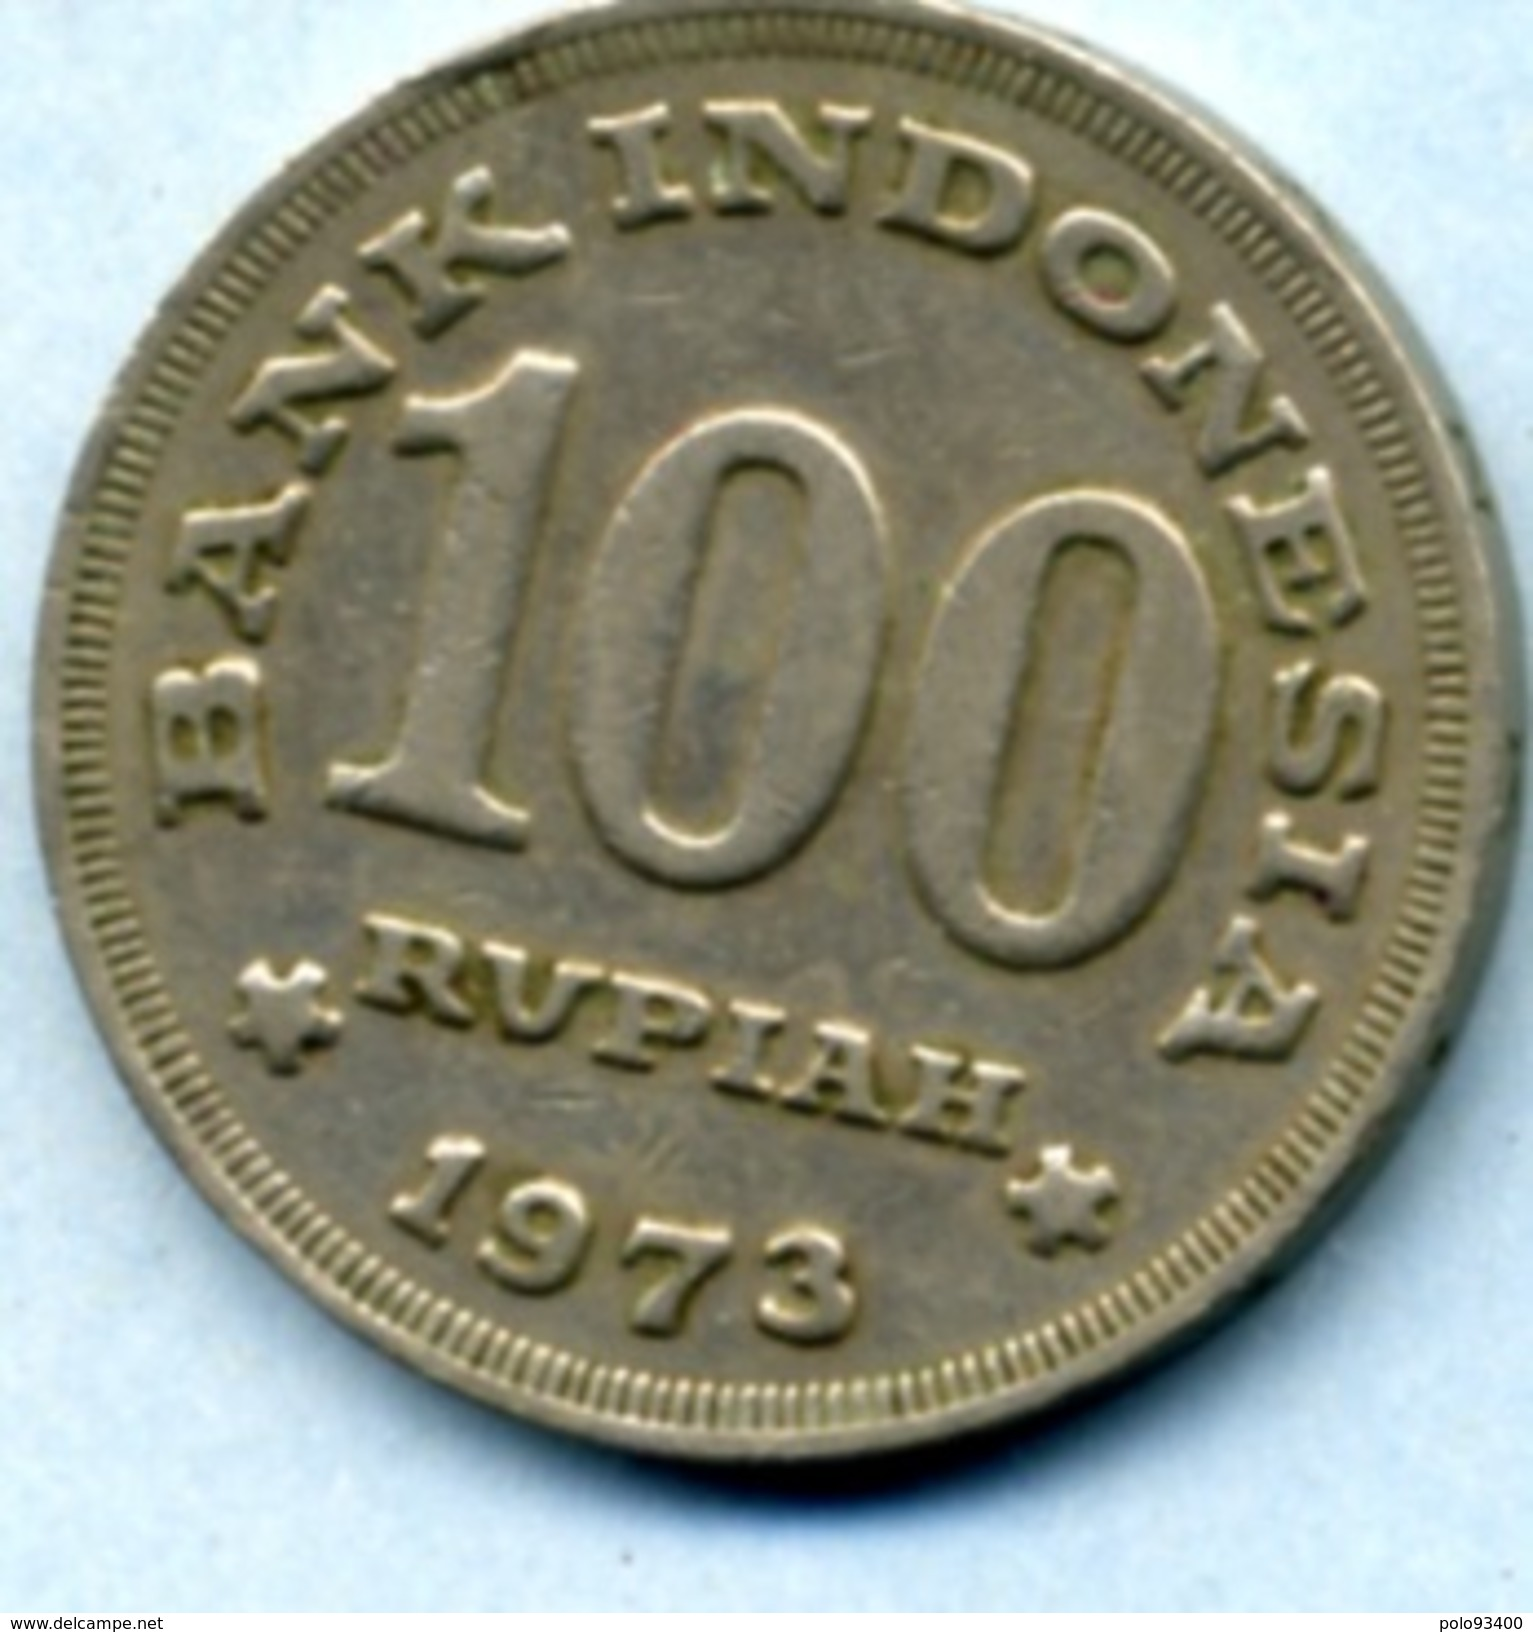 1973 100 ROUPIES - Indonesia